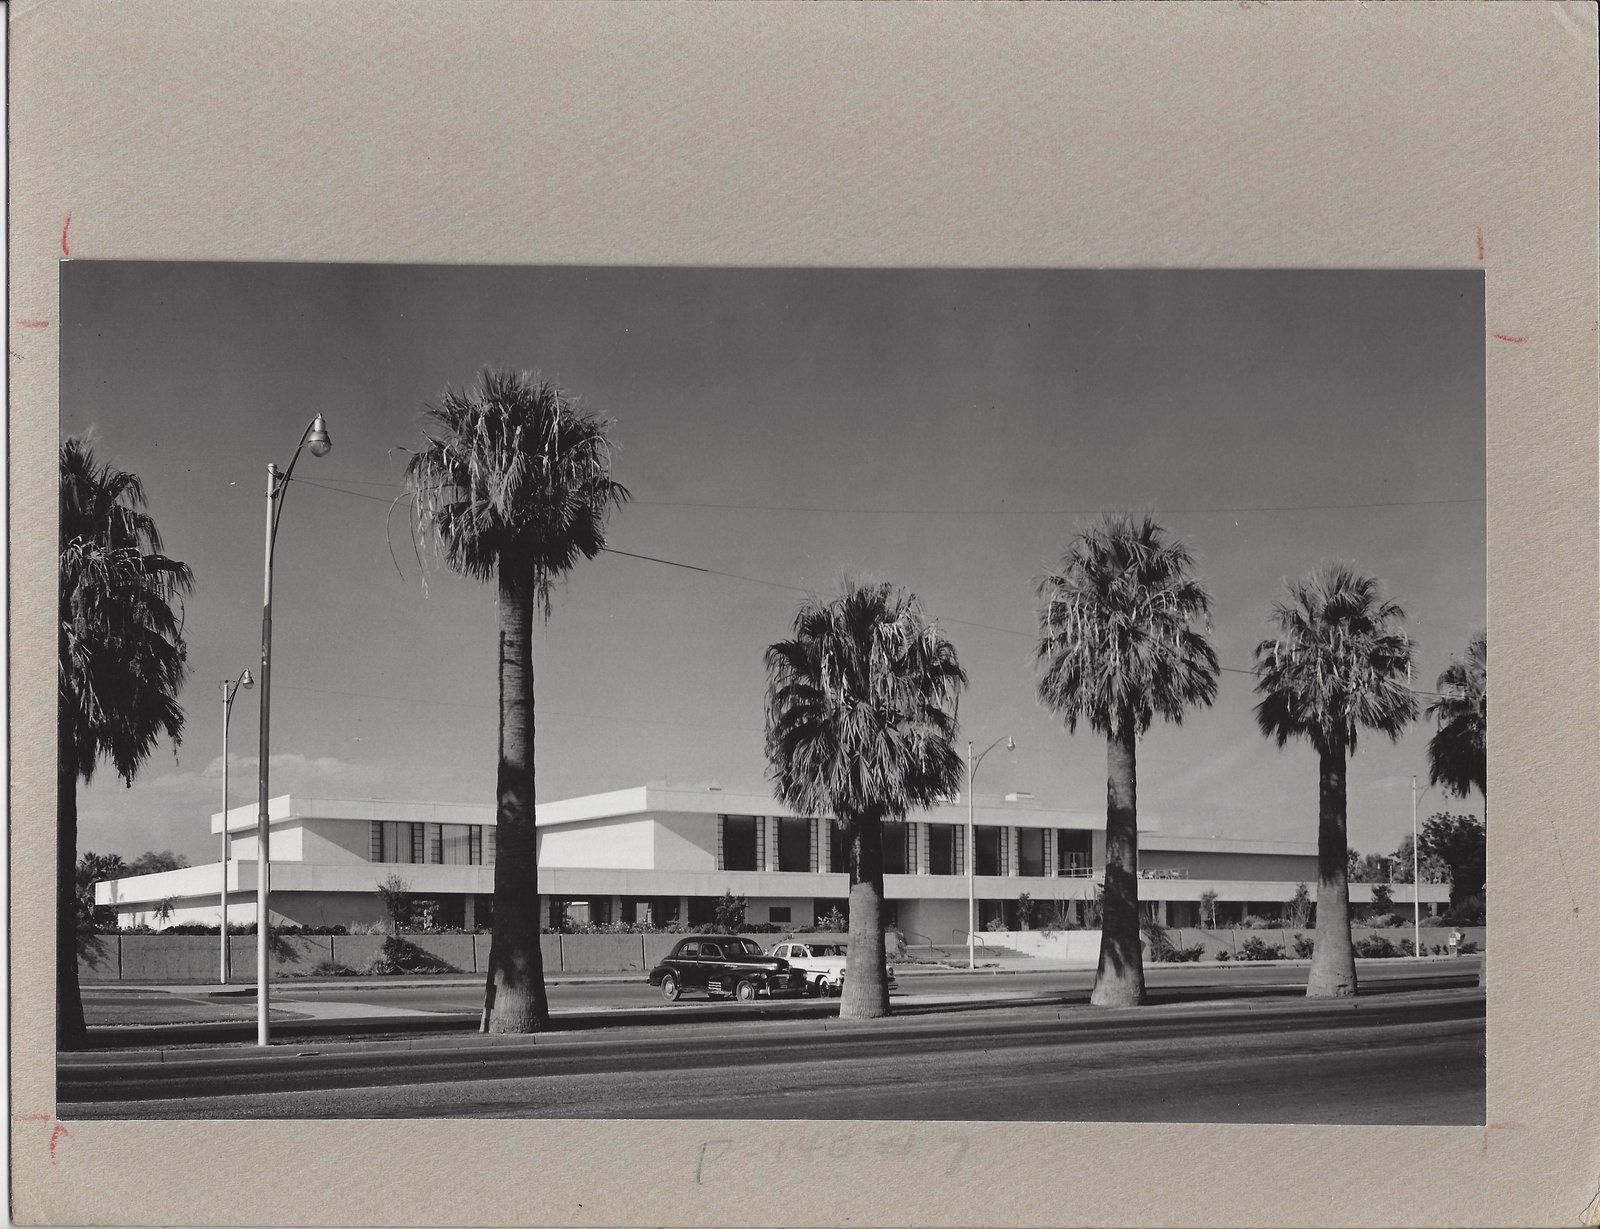 Photo 4 of 6 in Phoenix Civic Center